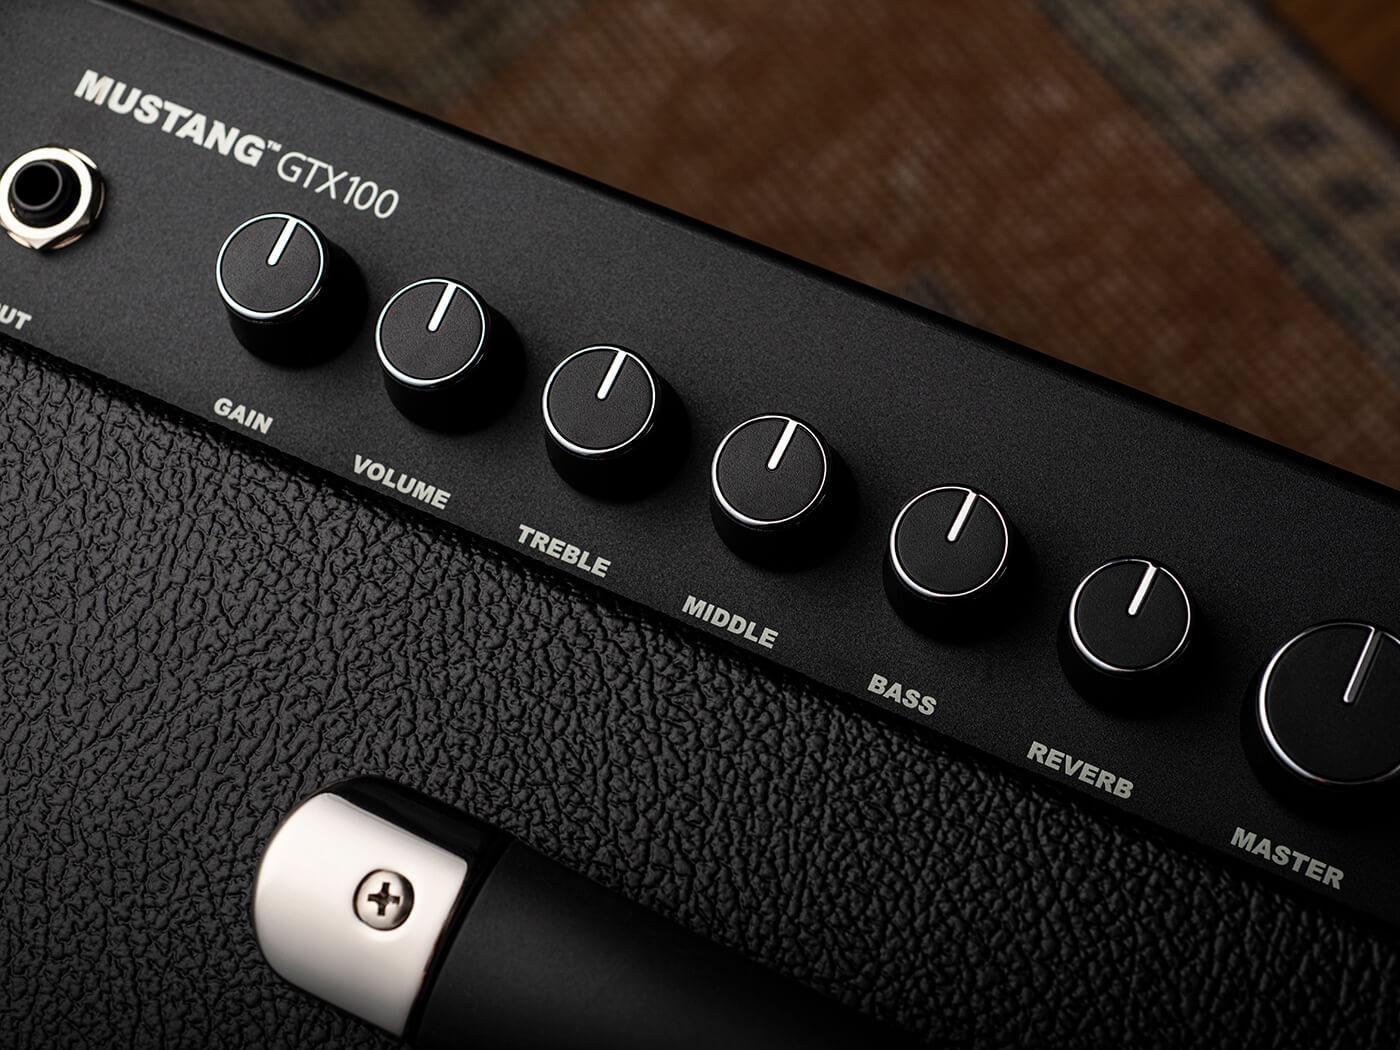 Fender Mustang GTX100 Controls